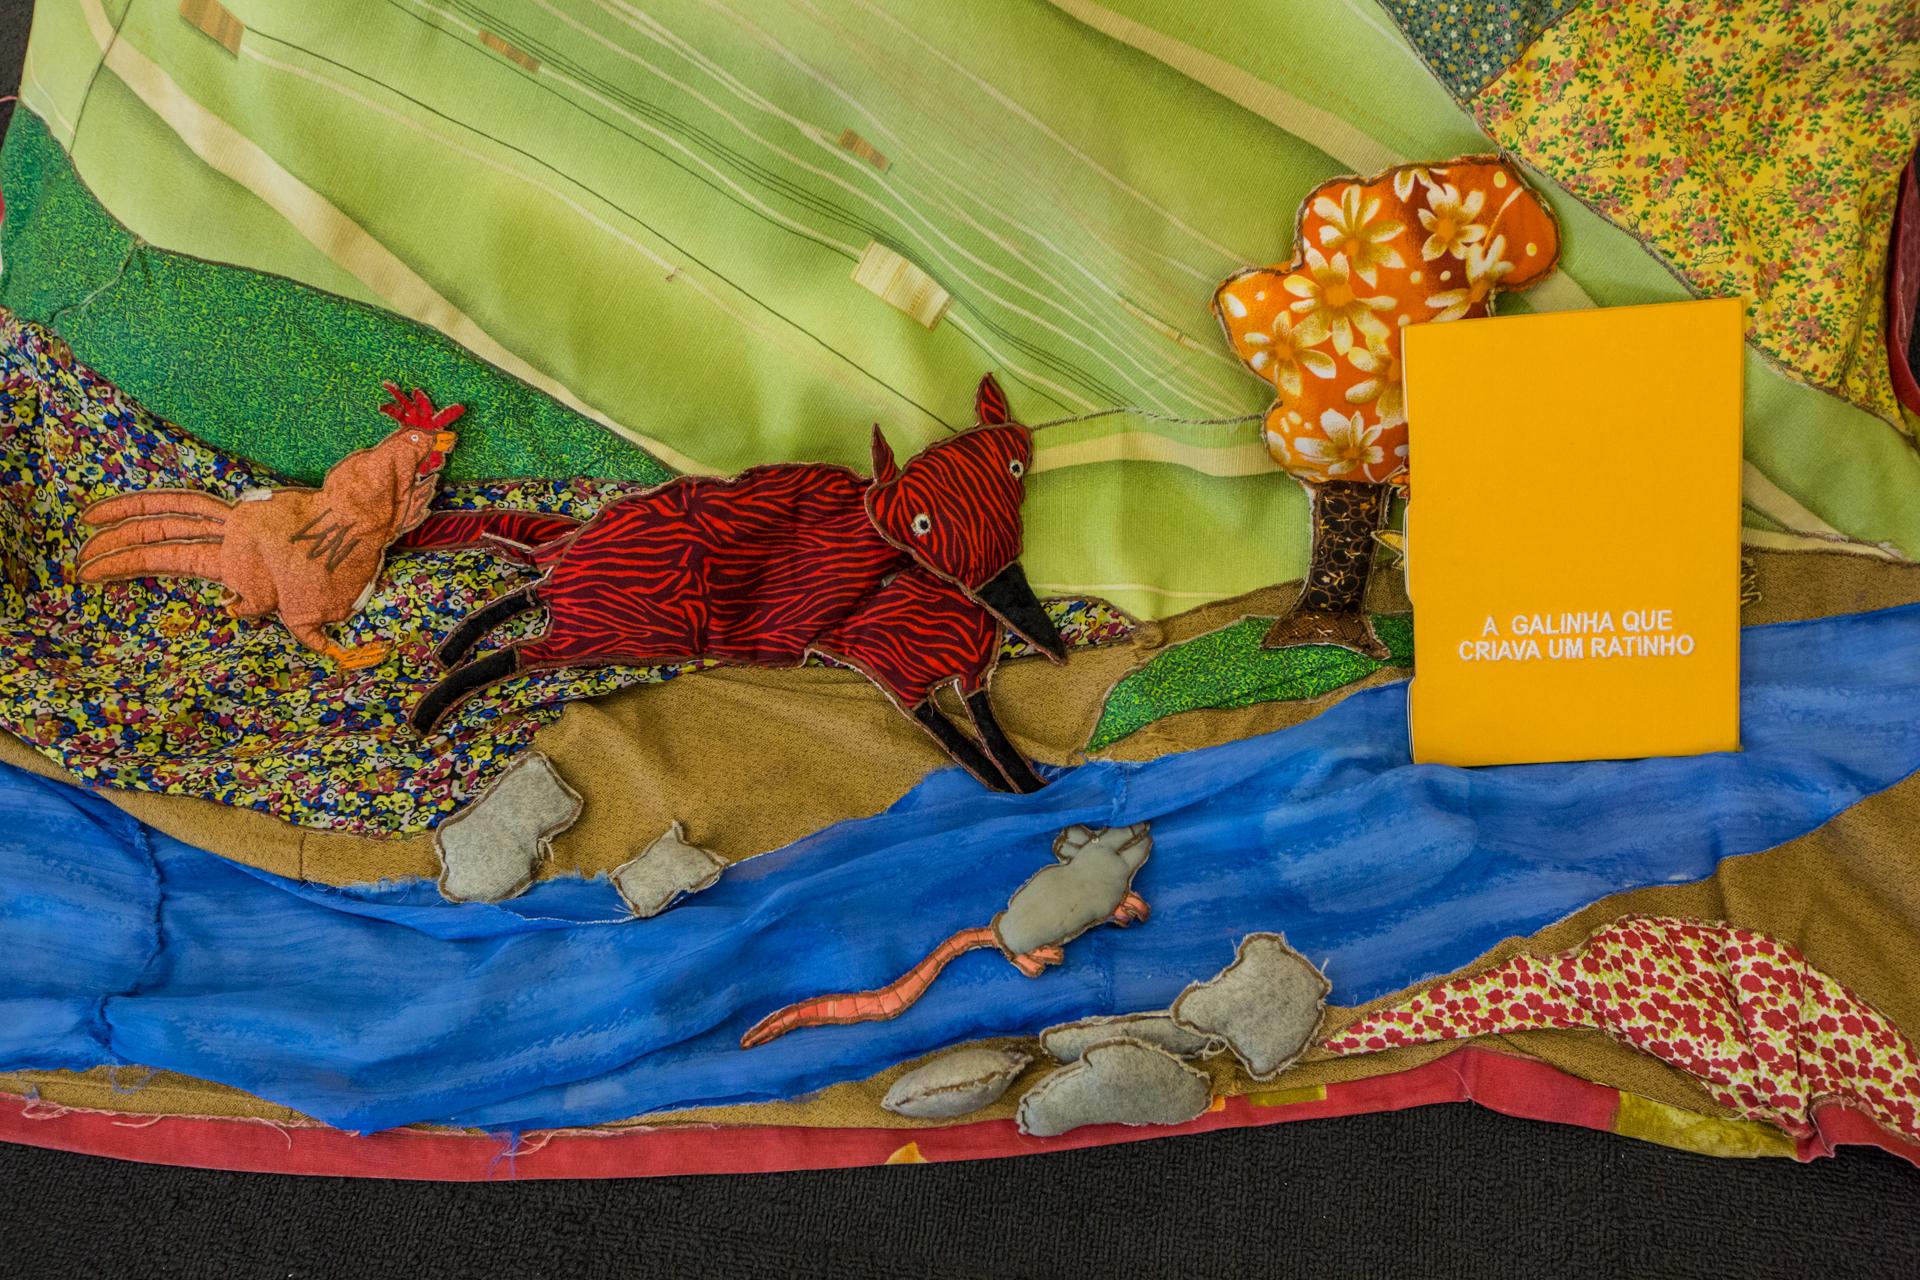 Livro de pano colorido com raposa bordada